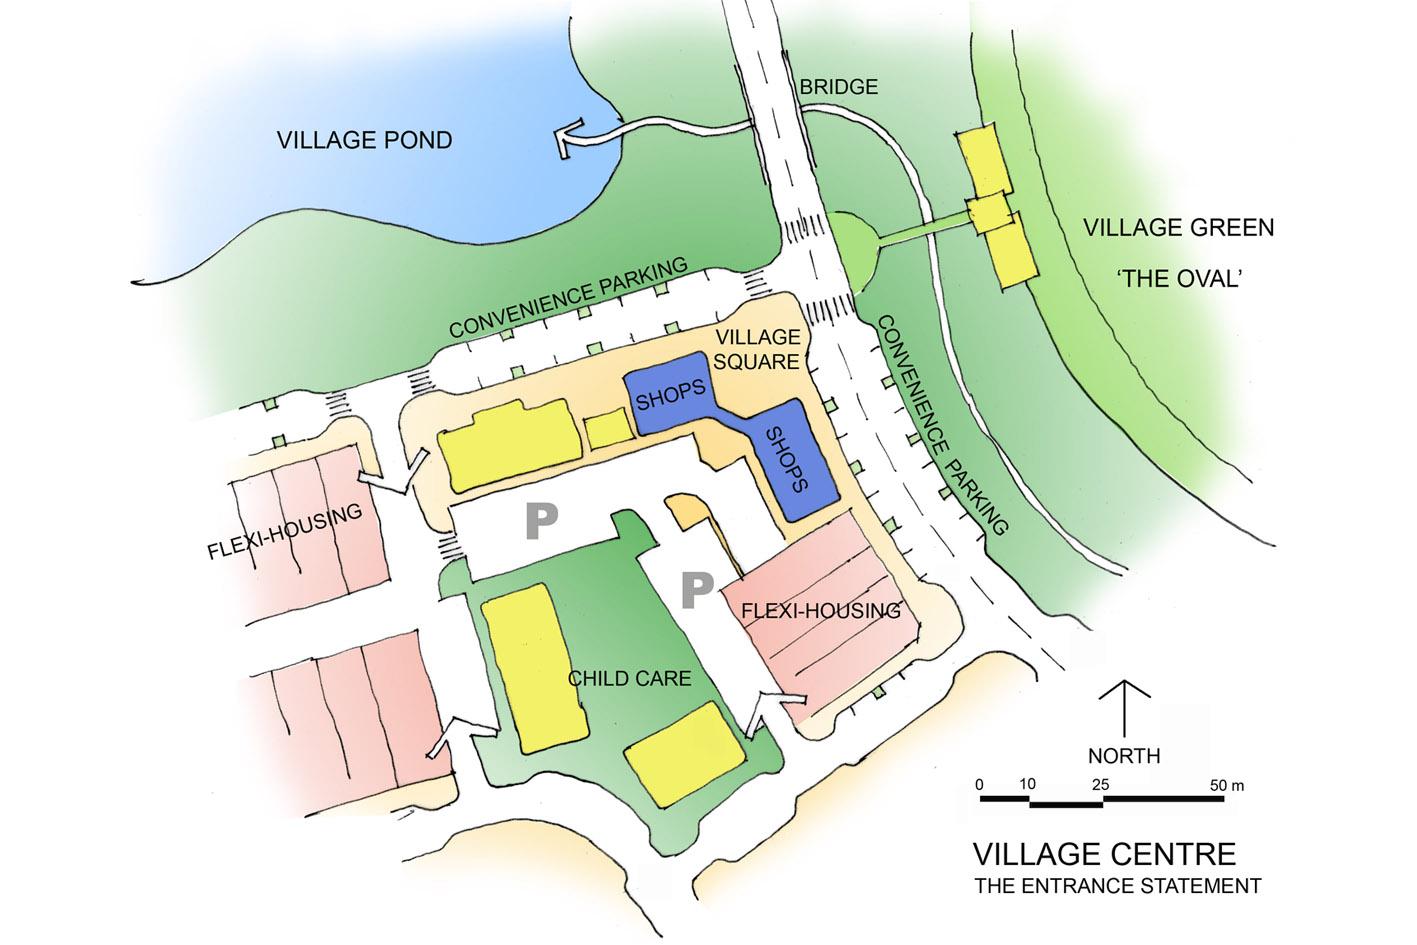 070723_Village Centre Plan.jpg